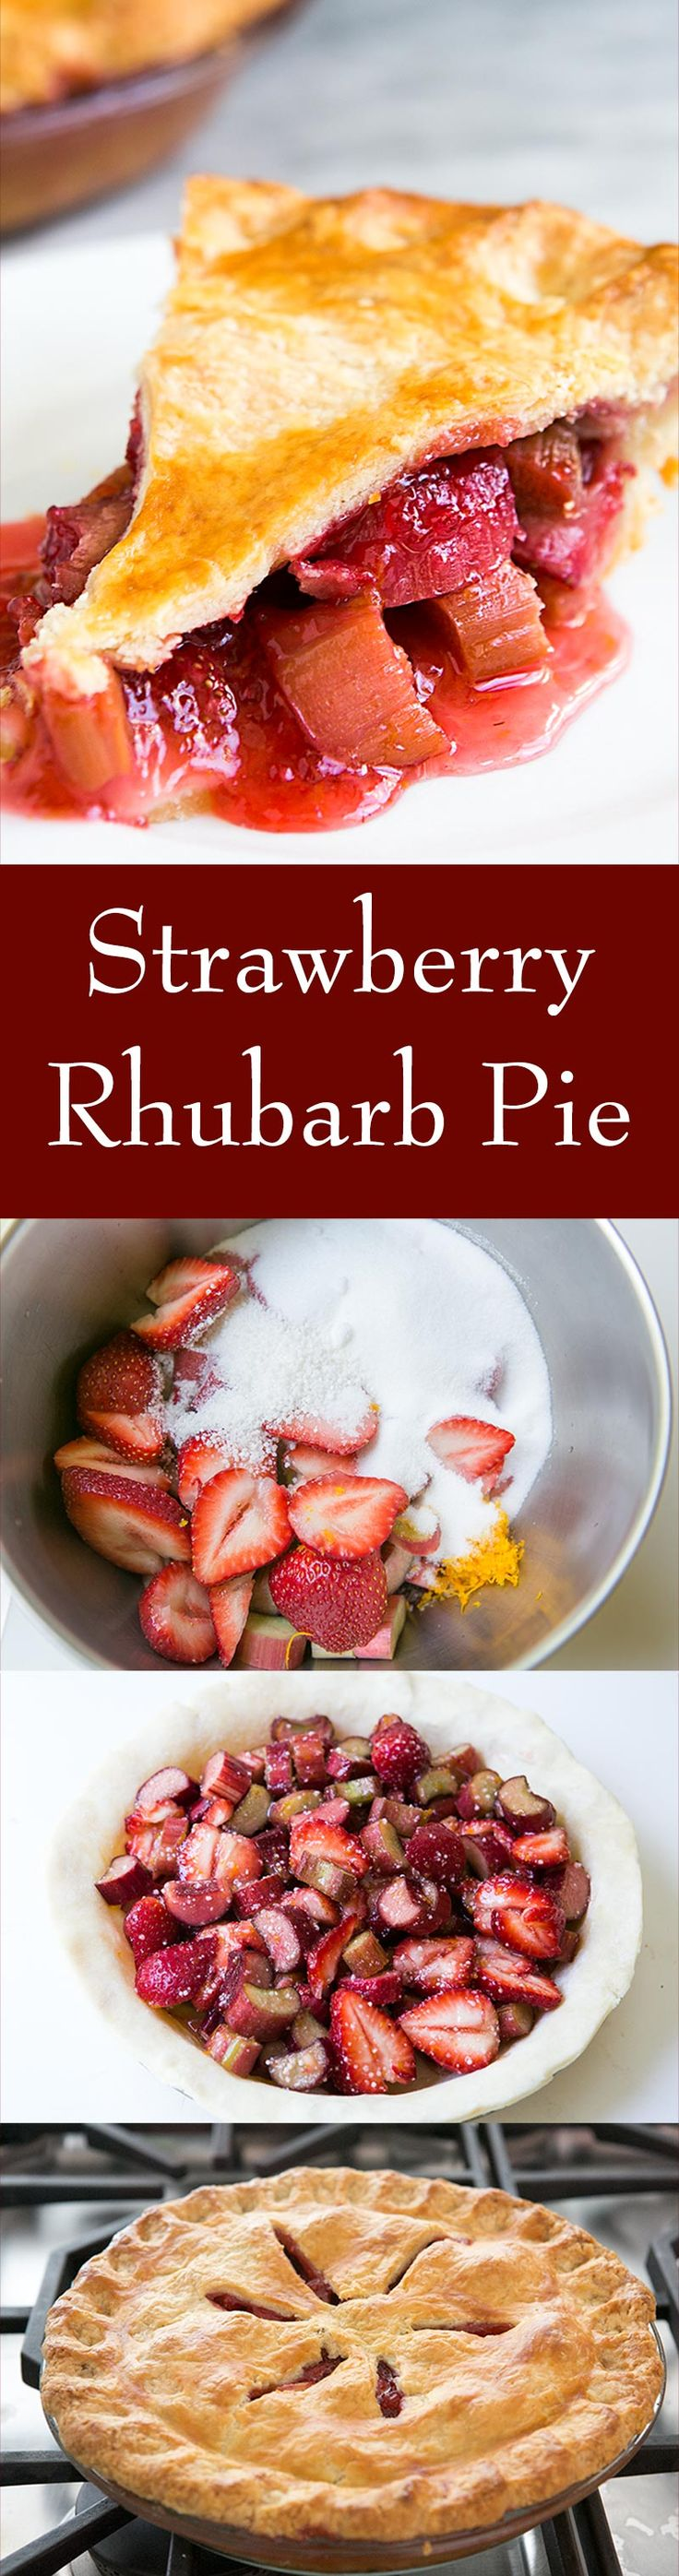 25+ Best Ideas about Strawberry Rhubarb Pie on Pinterest ...